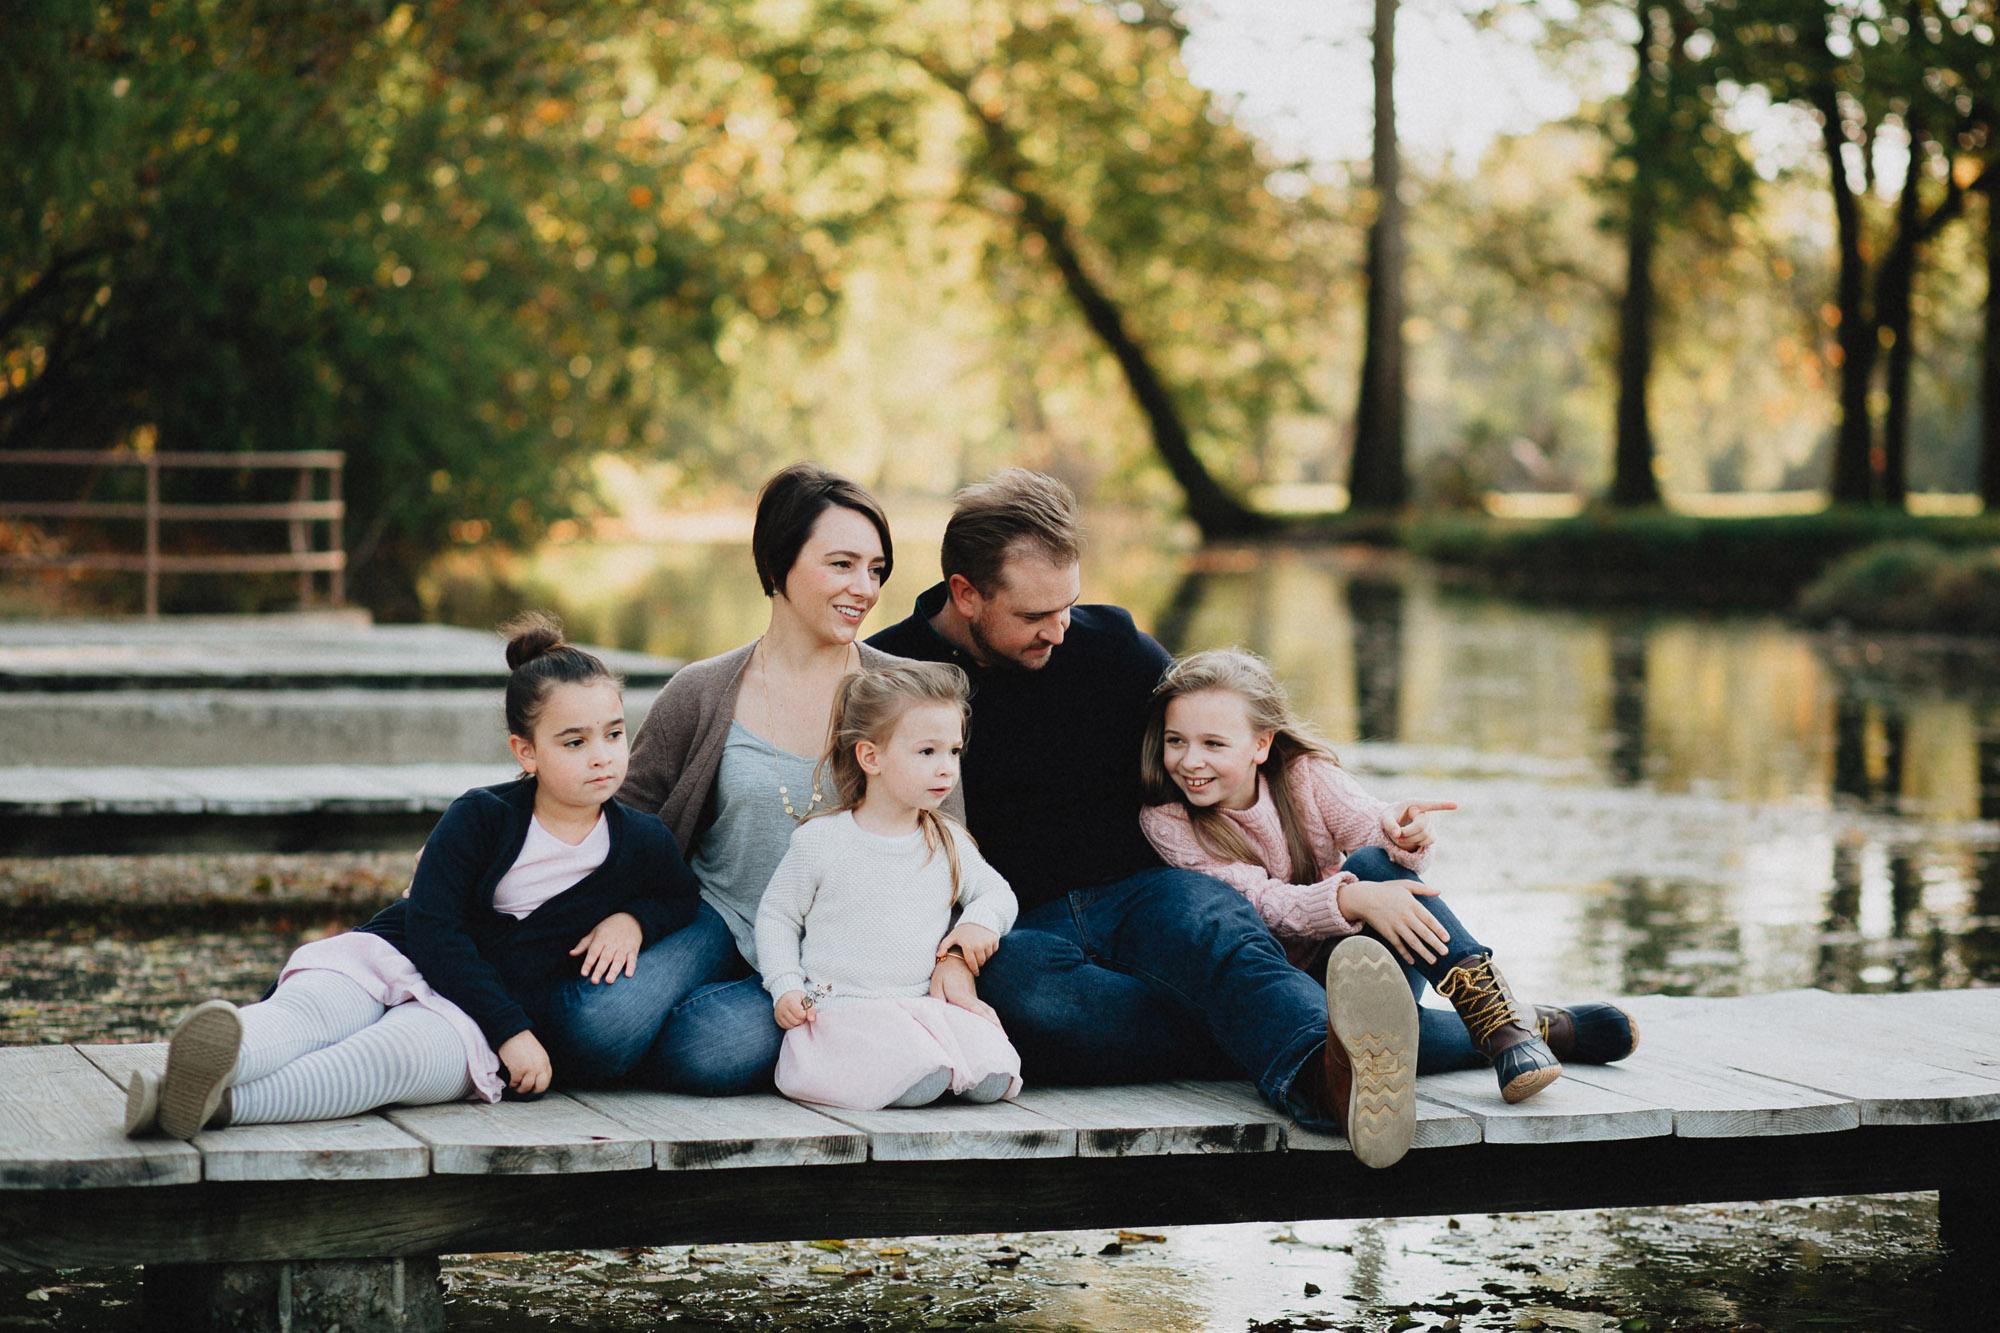 The Brauns - Dayton Family Photos - 16.jpg